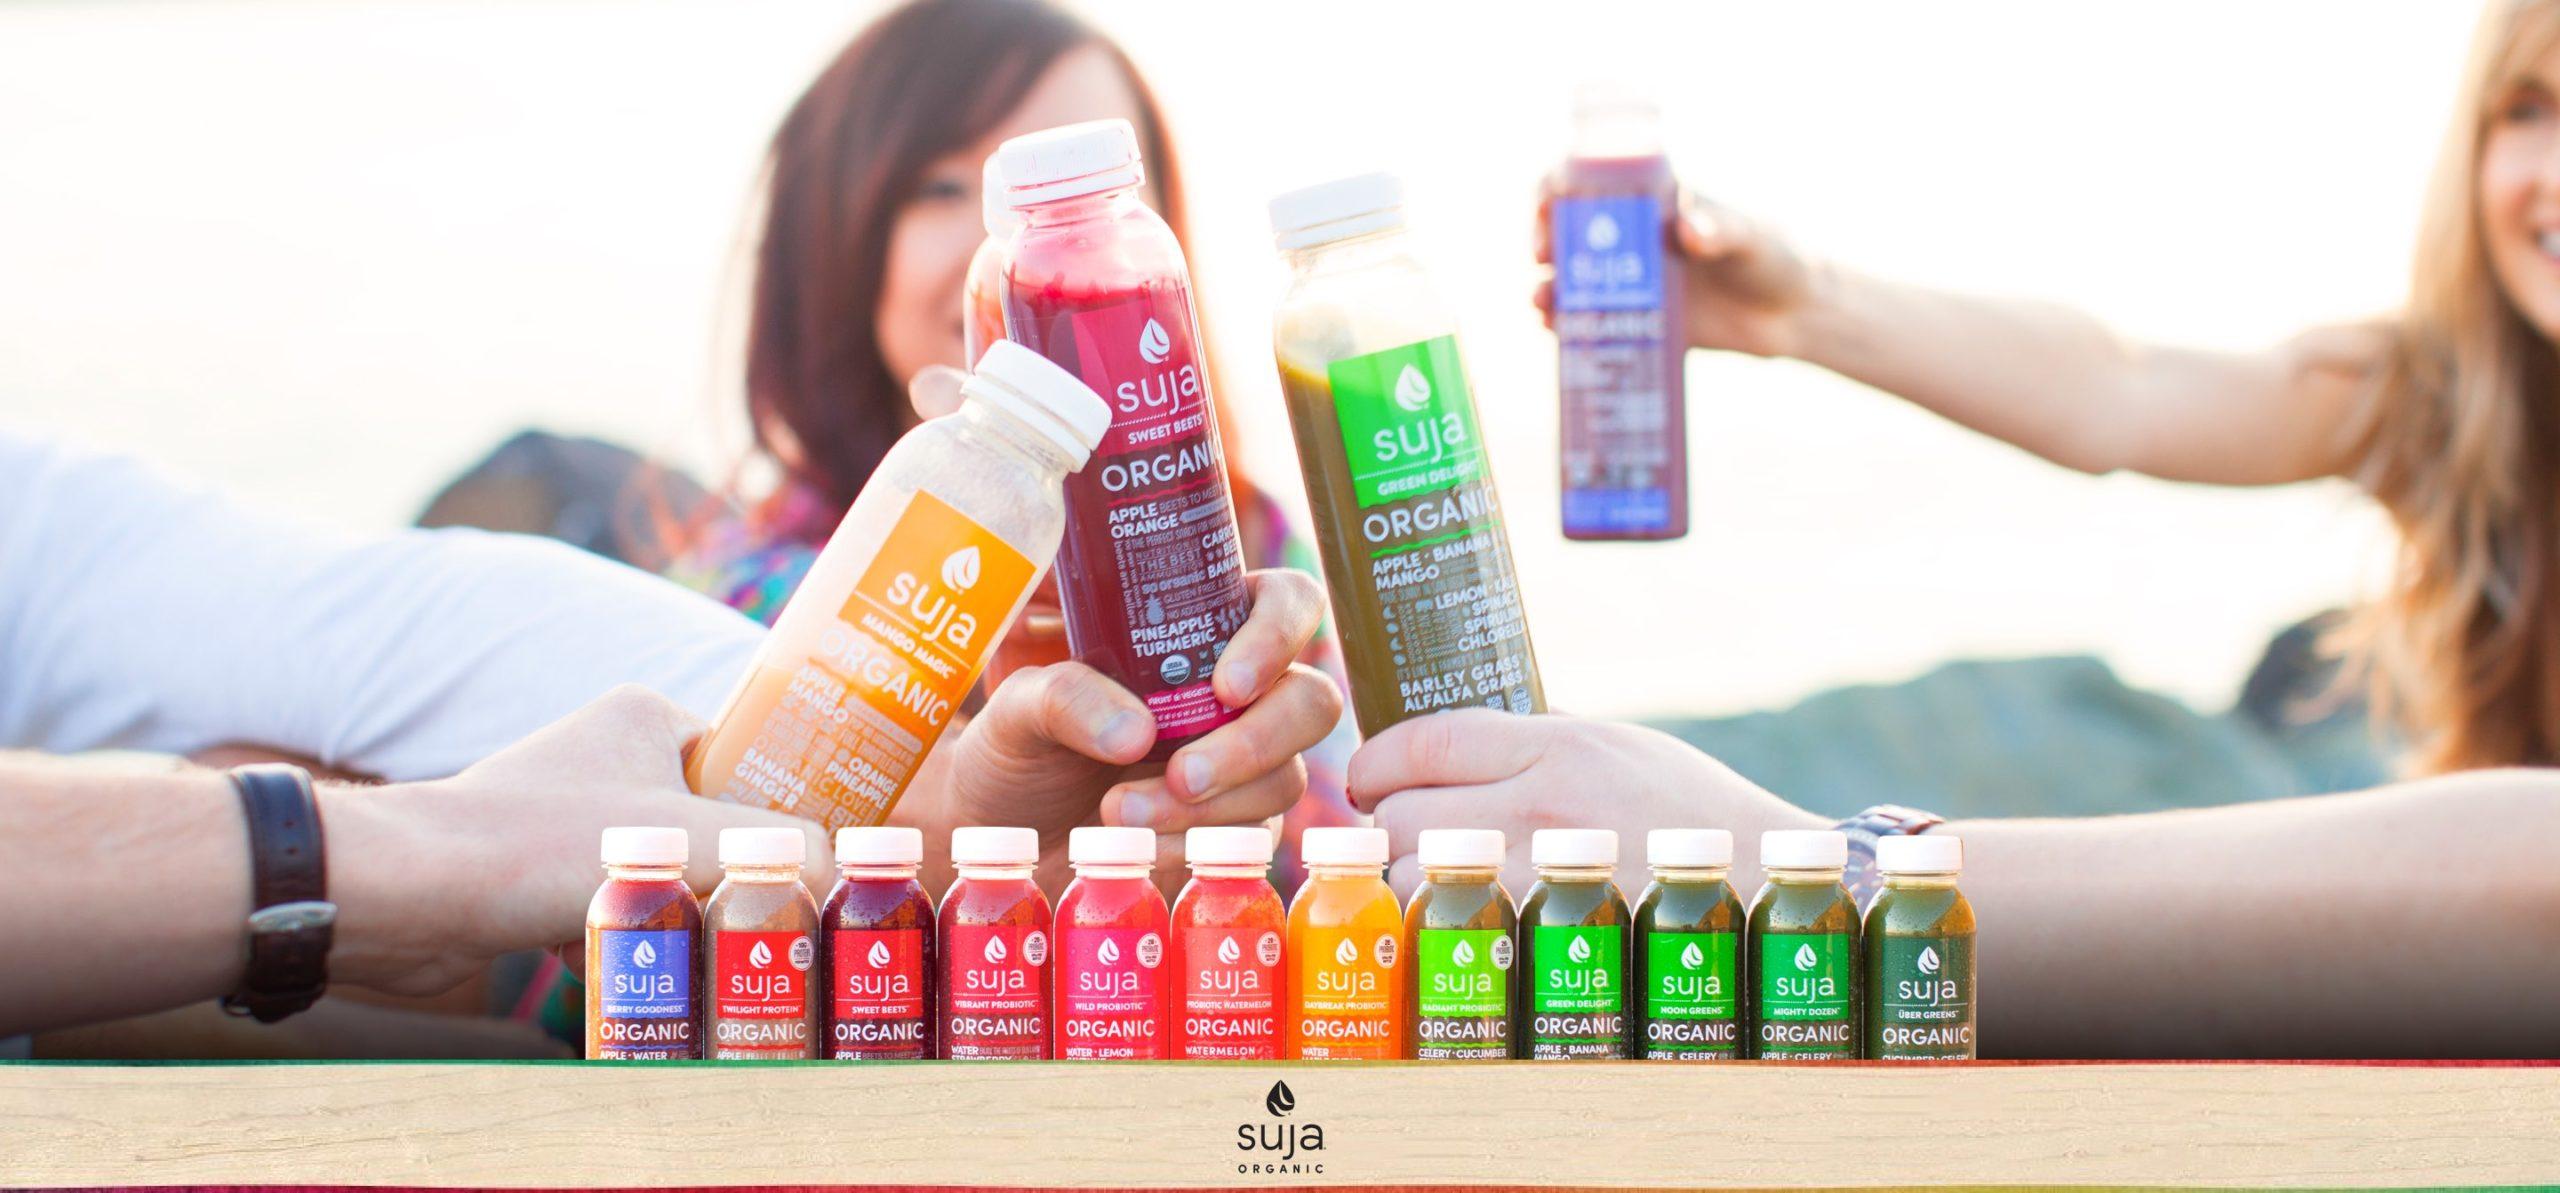 FREE $5 Fandango Movie Code w/ Purchase of 2 Suja Organic Drinks